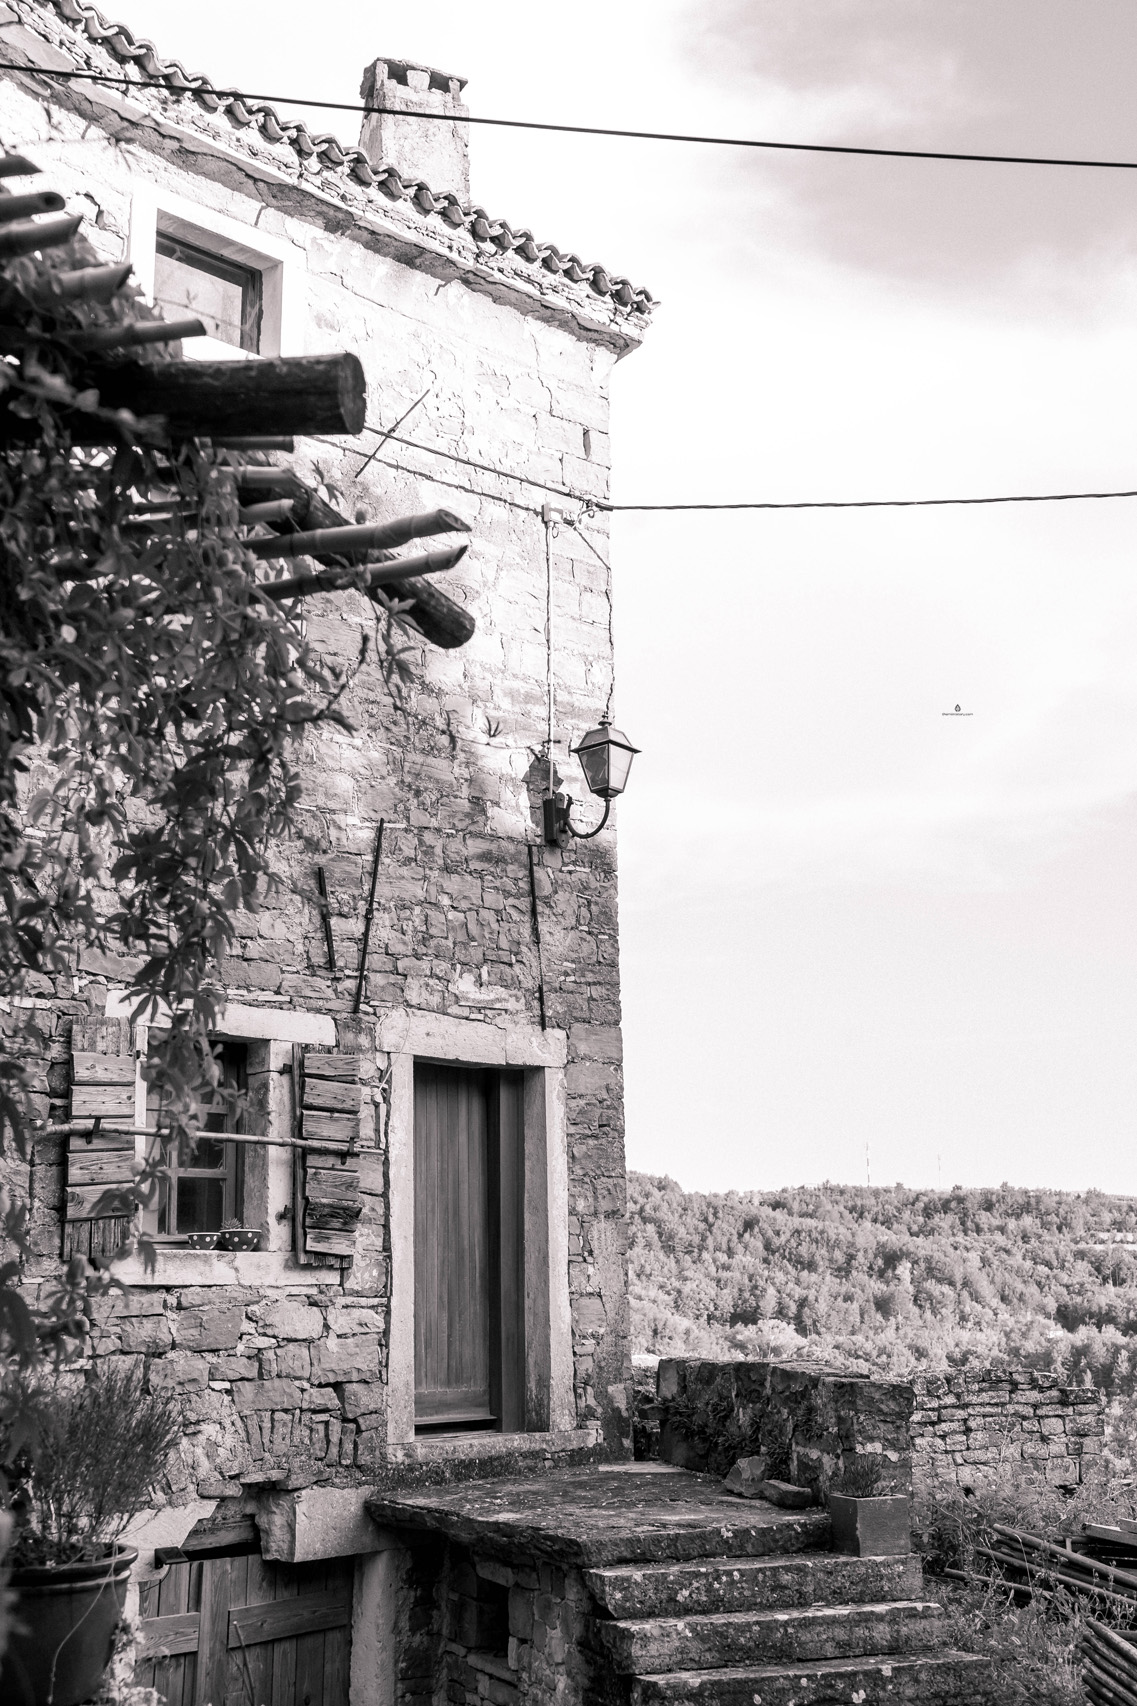 A house in Oprtalj, Istria